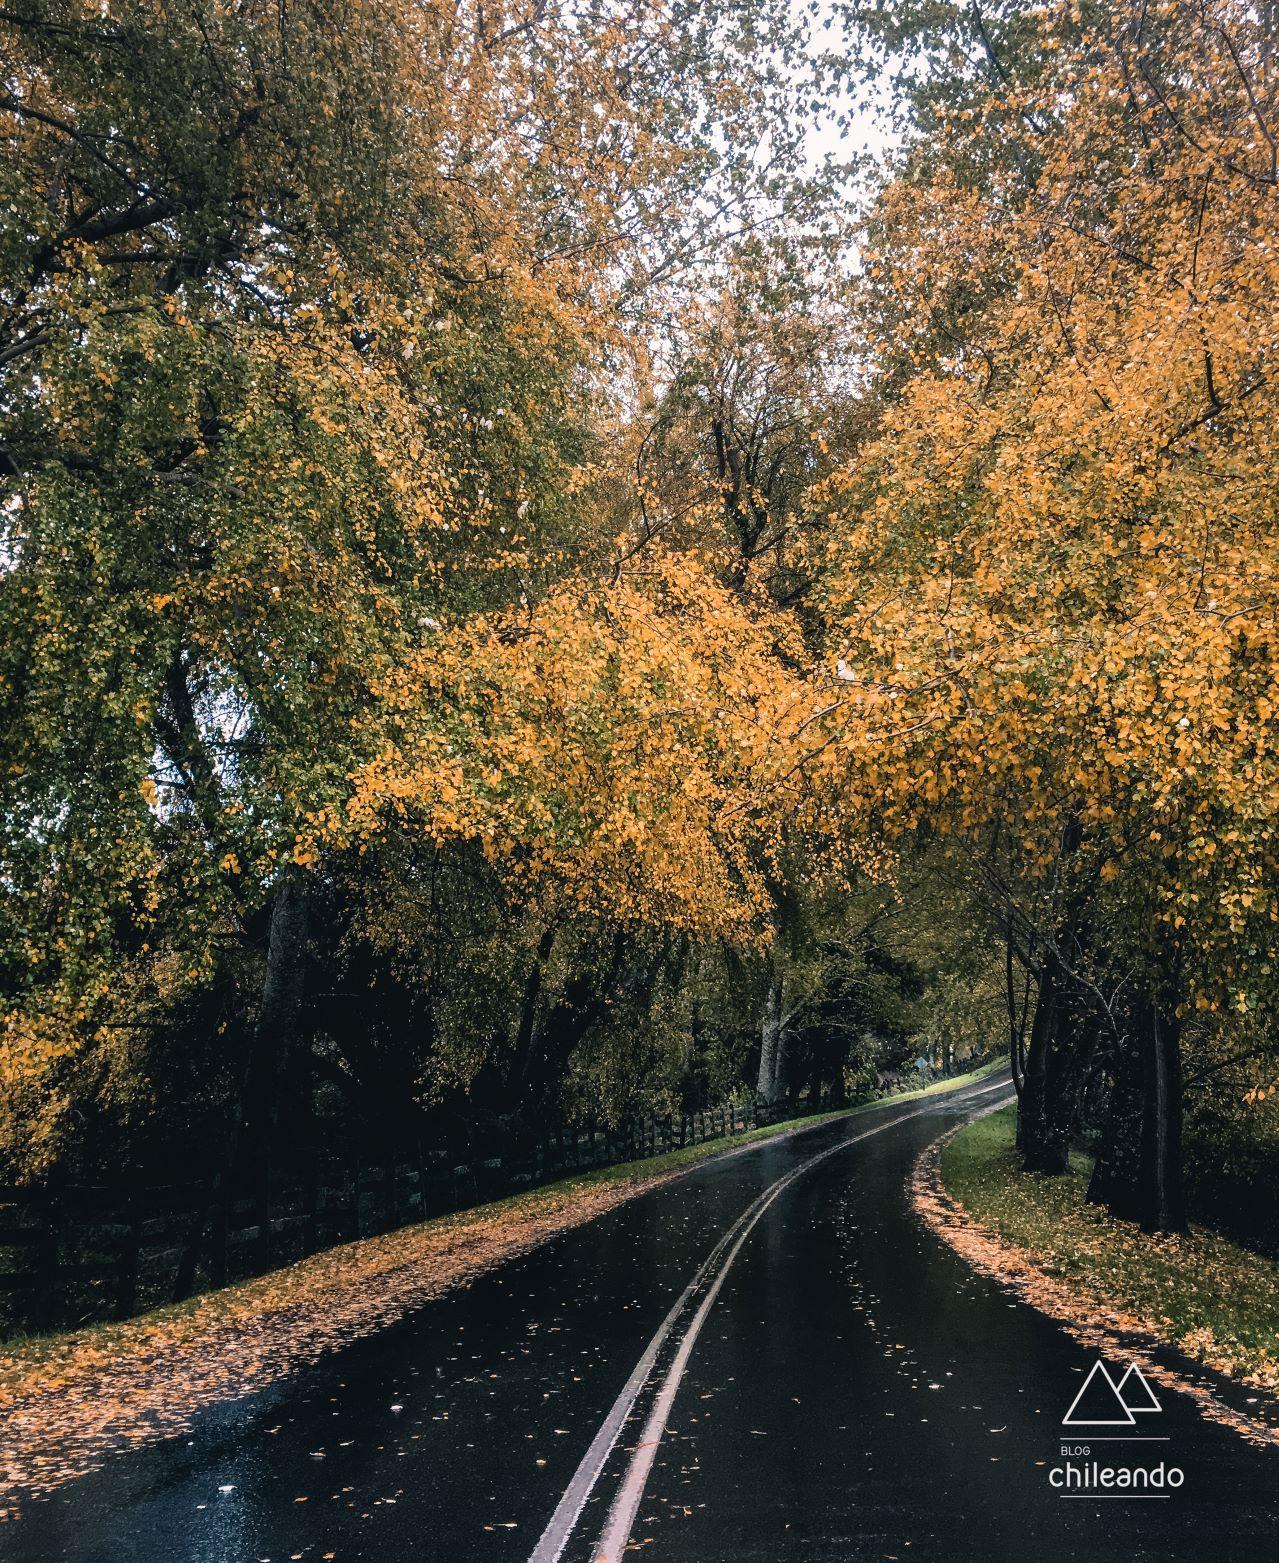 Estradas espetaculares circundam o lago Llanquihue